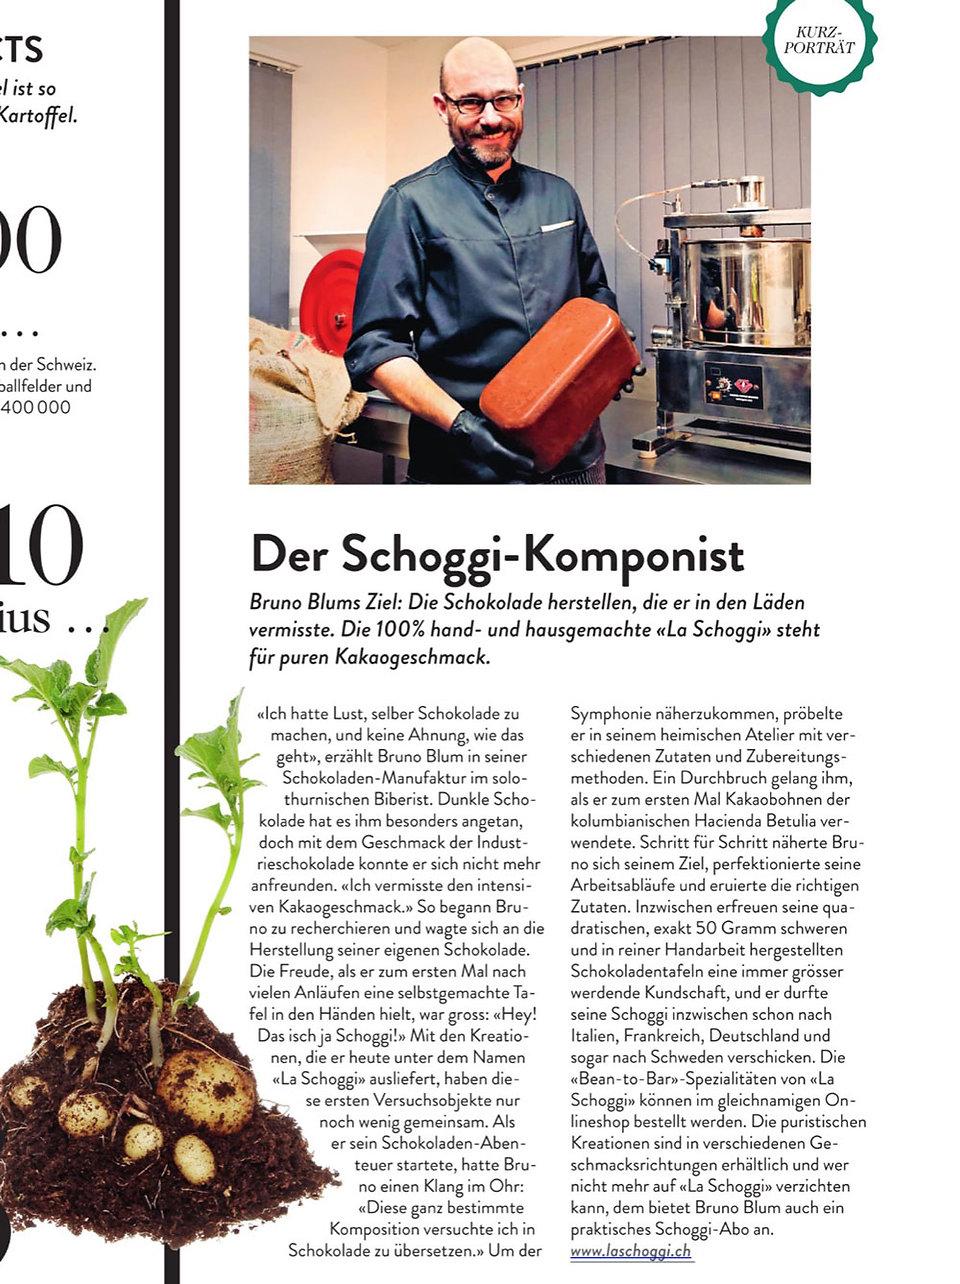 LaSchoggi_AW-Kochen-Artikel_Newsletter.j